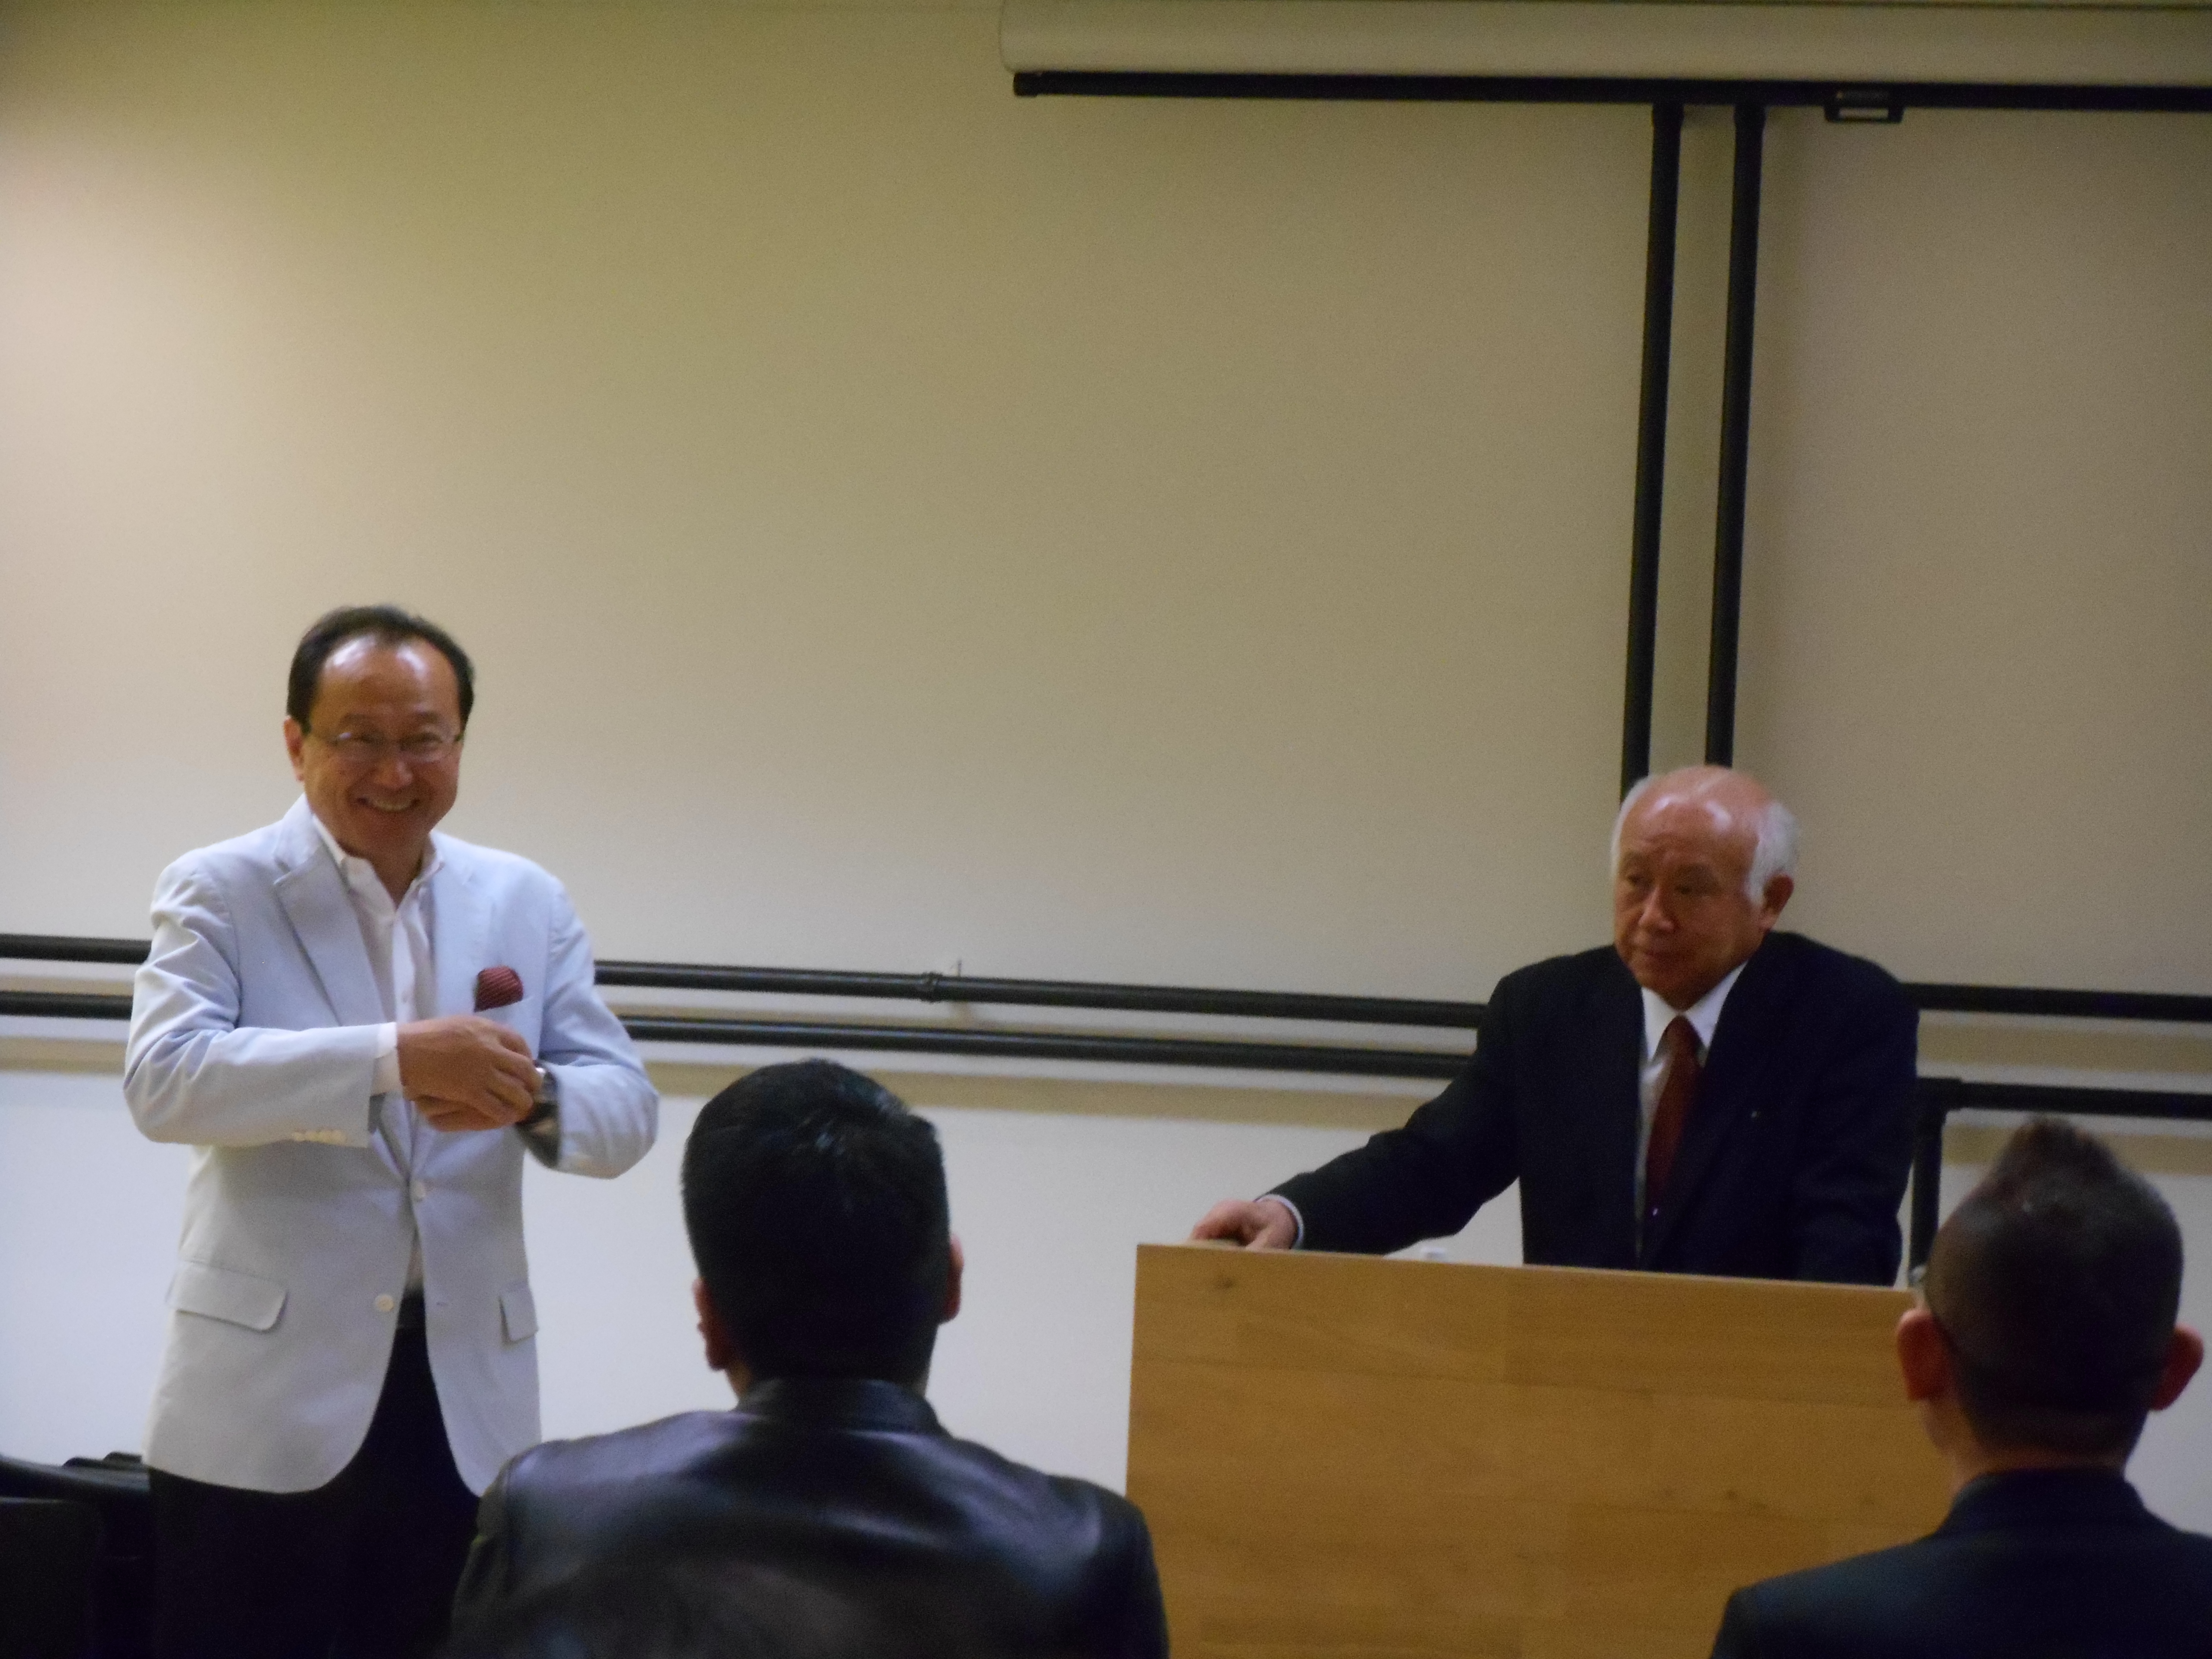 DSCN3734 - 平成30年度 東京思風塾 4月7日(土)「時代が問題をつくり、問題が人物をつくる」